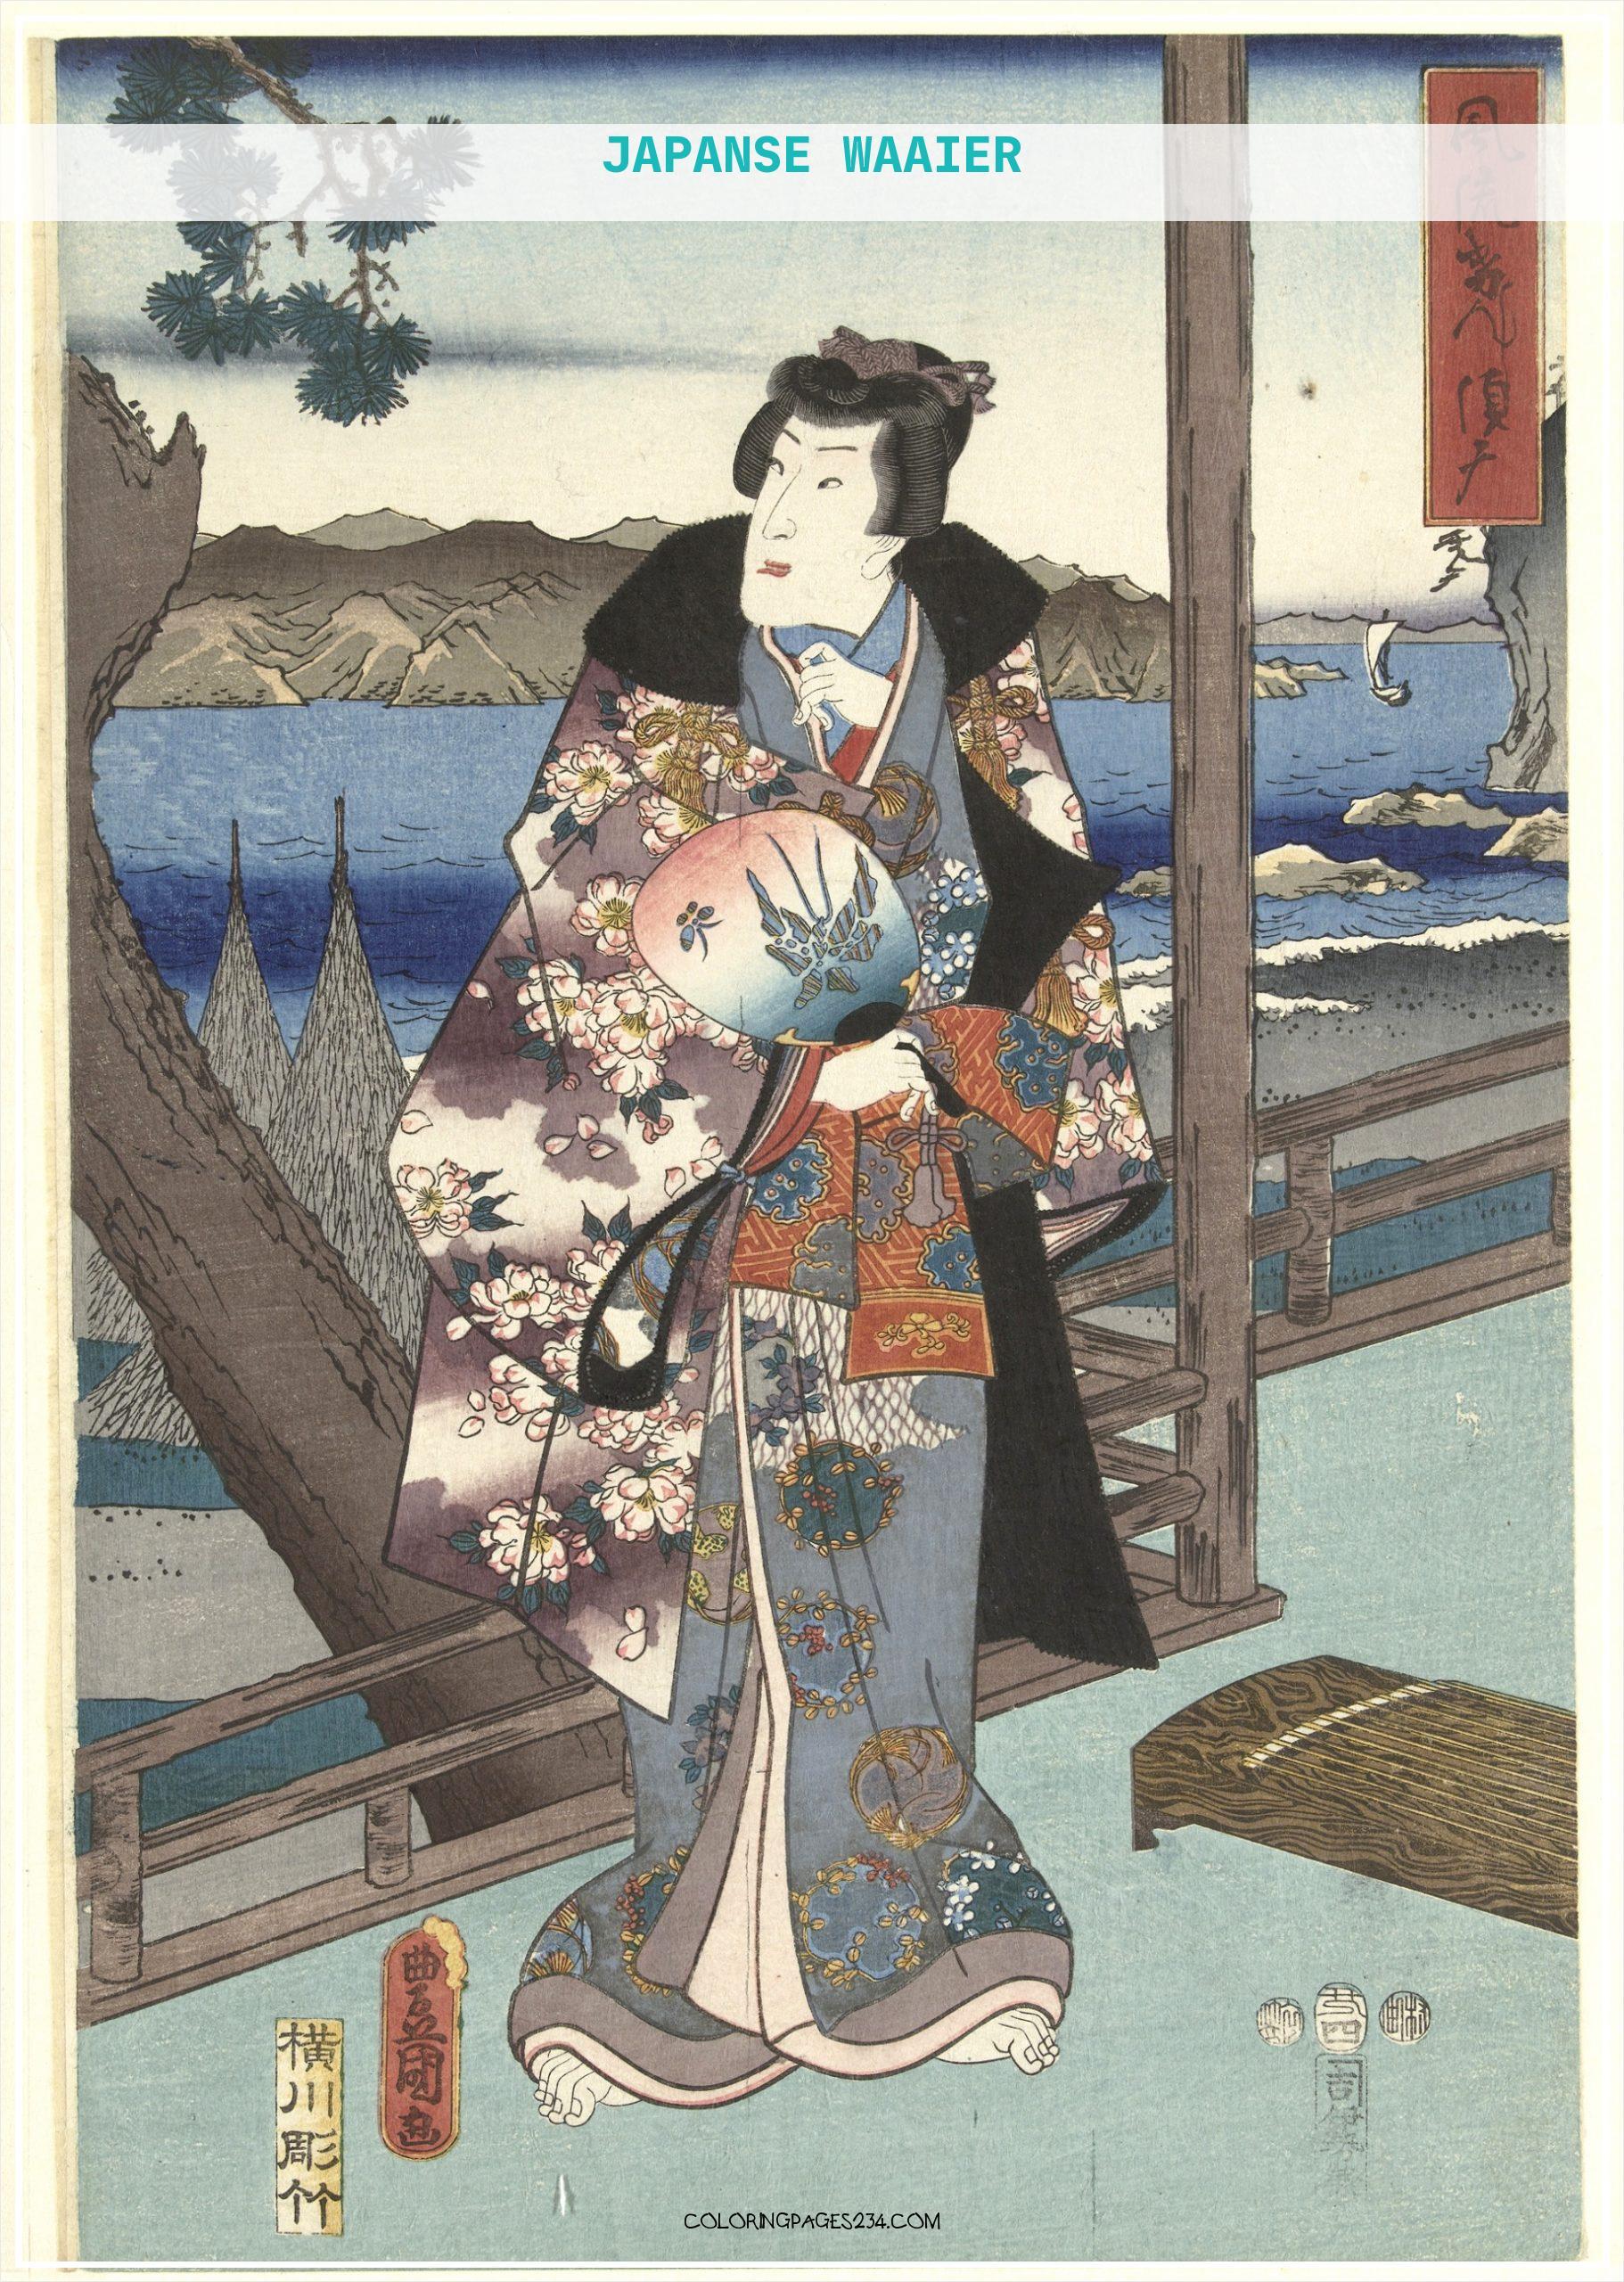 File De elegante prins Genji te Suma Rijksmuseum RP P OB JAP japanse waaier, source:commons.wikimedia.org